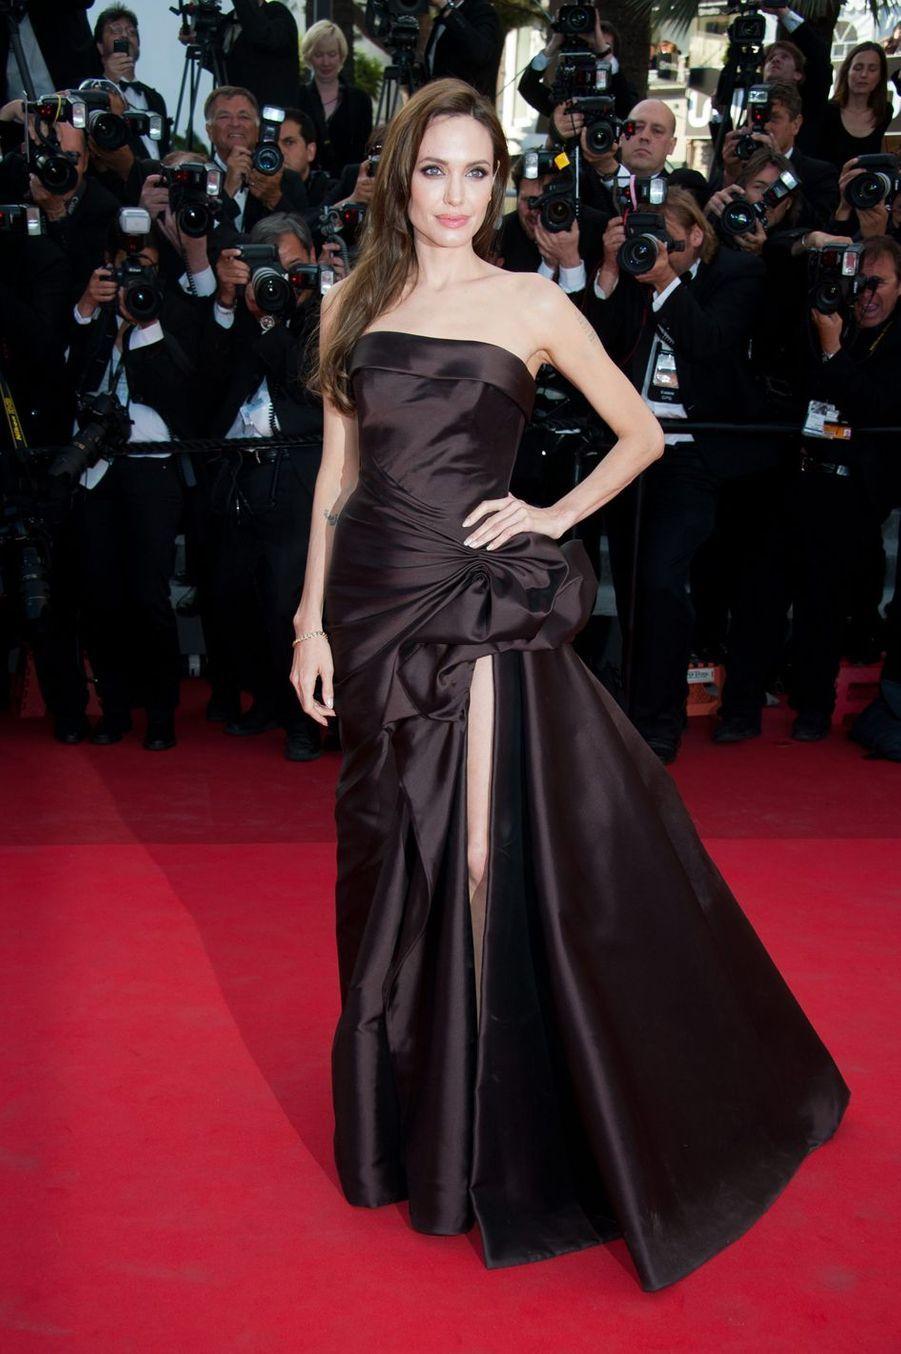 Angelina Jolie lors du Festival de Cannes, le 16 mai 2011